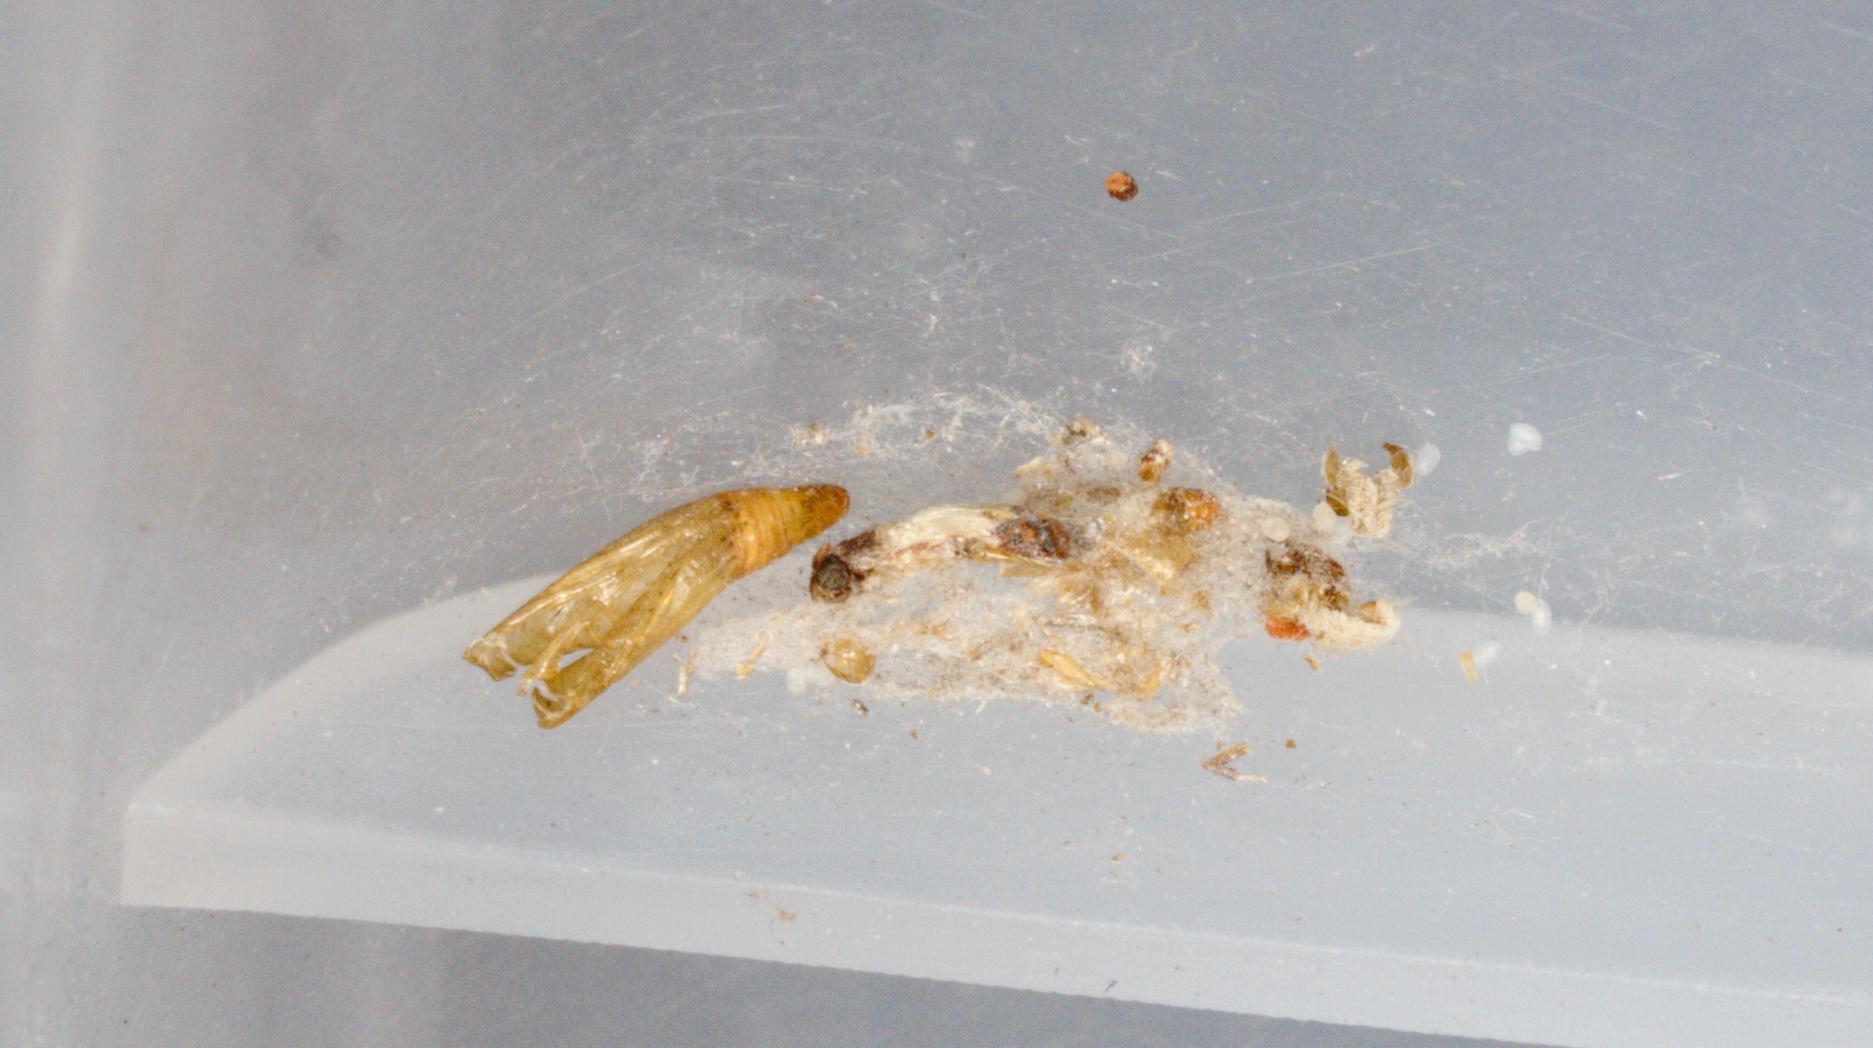 Indianmeal-moth-9.jpeg